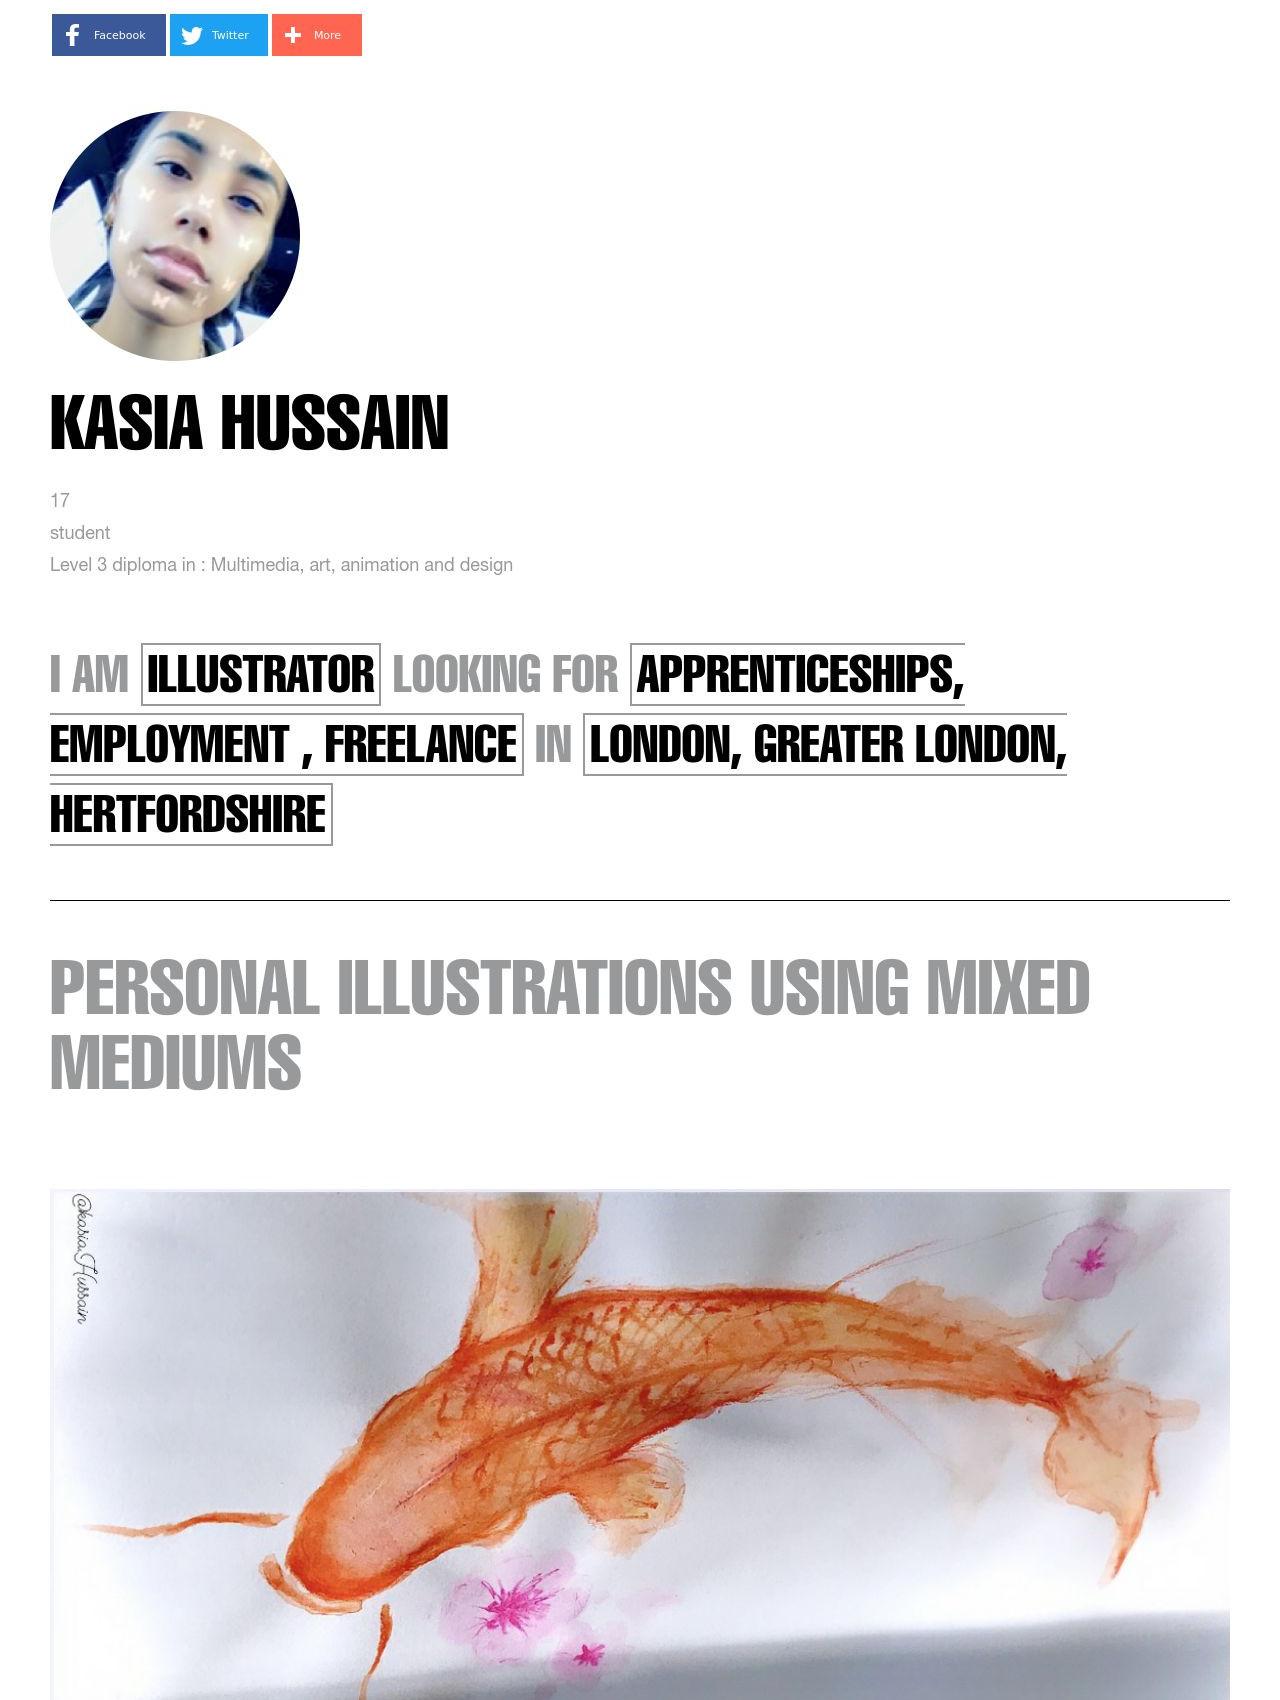 Kasia Hussain